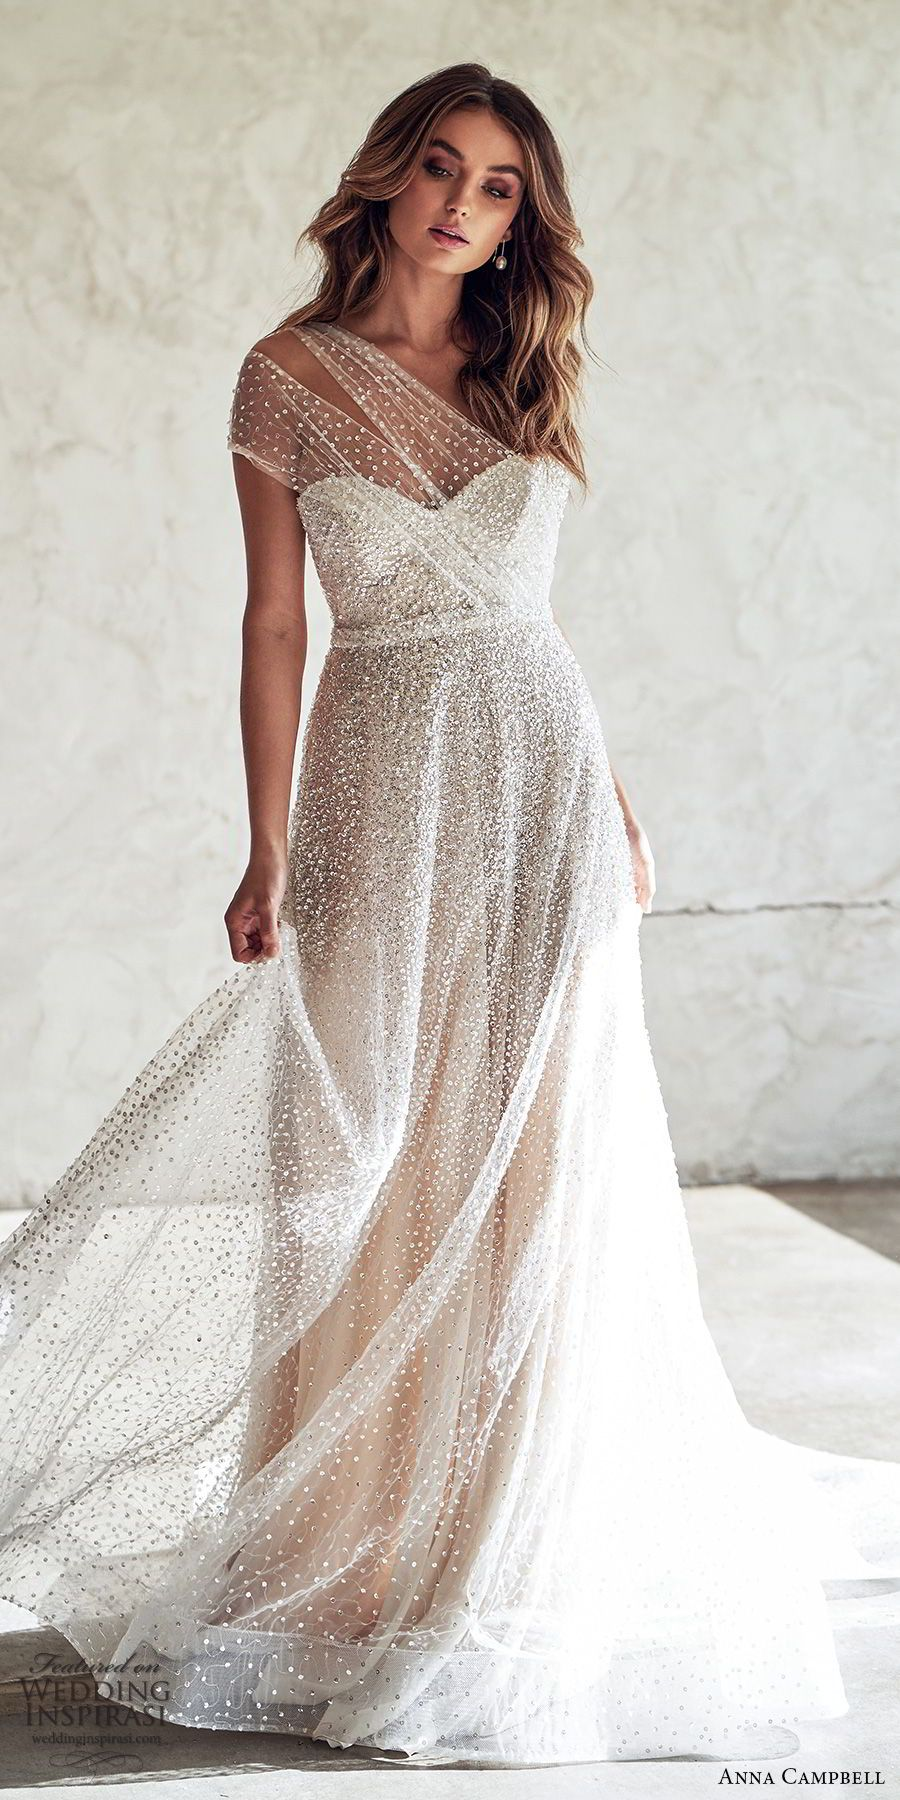 Anna Campbell 2020 Wedding Dresses Lumiere Bridal Collection Wedding Inspirasi Anna Campbell Wedding Dress A Line Wedding Dress Anna Campbell Bridal